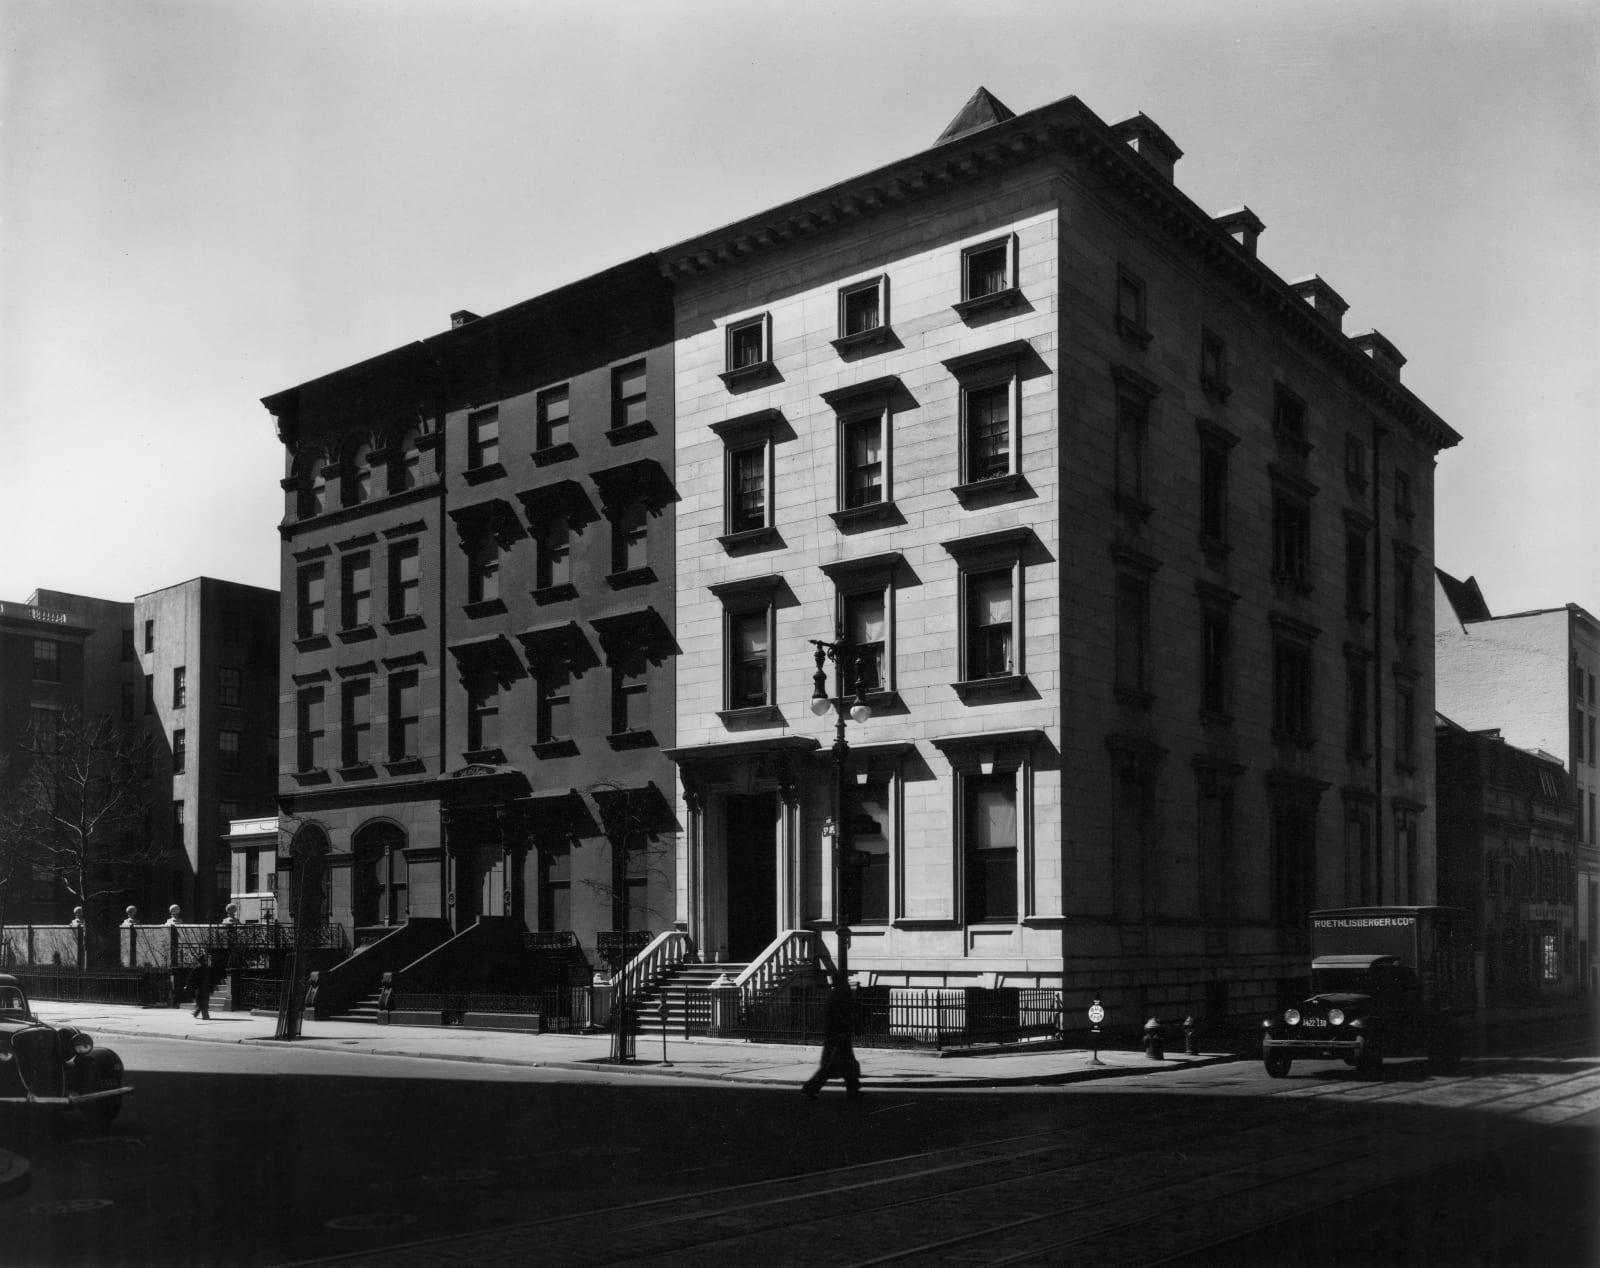 Berenice Abbott - 5th Avenue at 8th Street, Manhattan, March 20, 1936